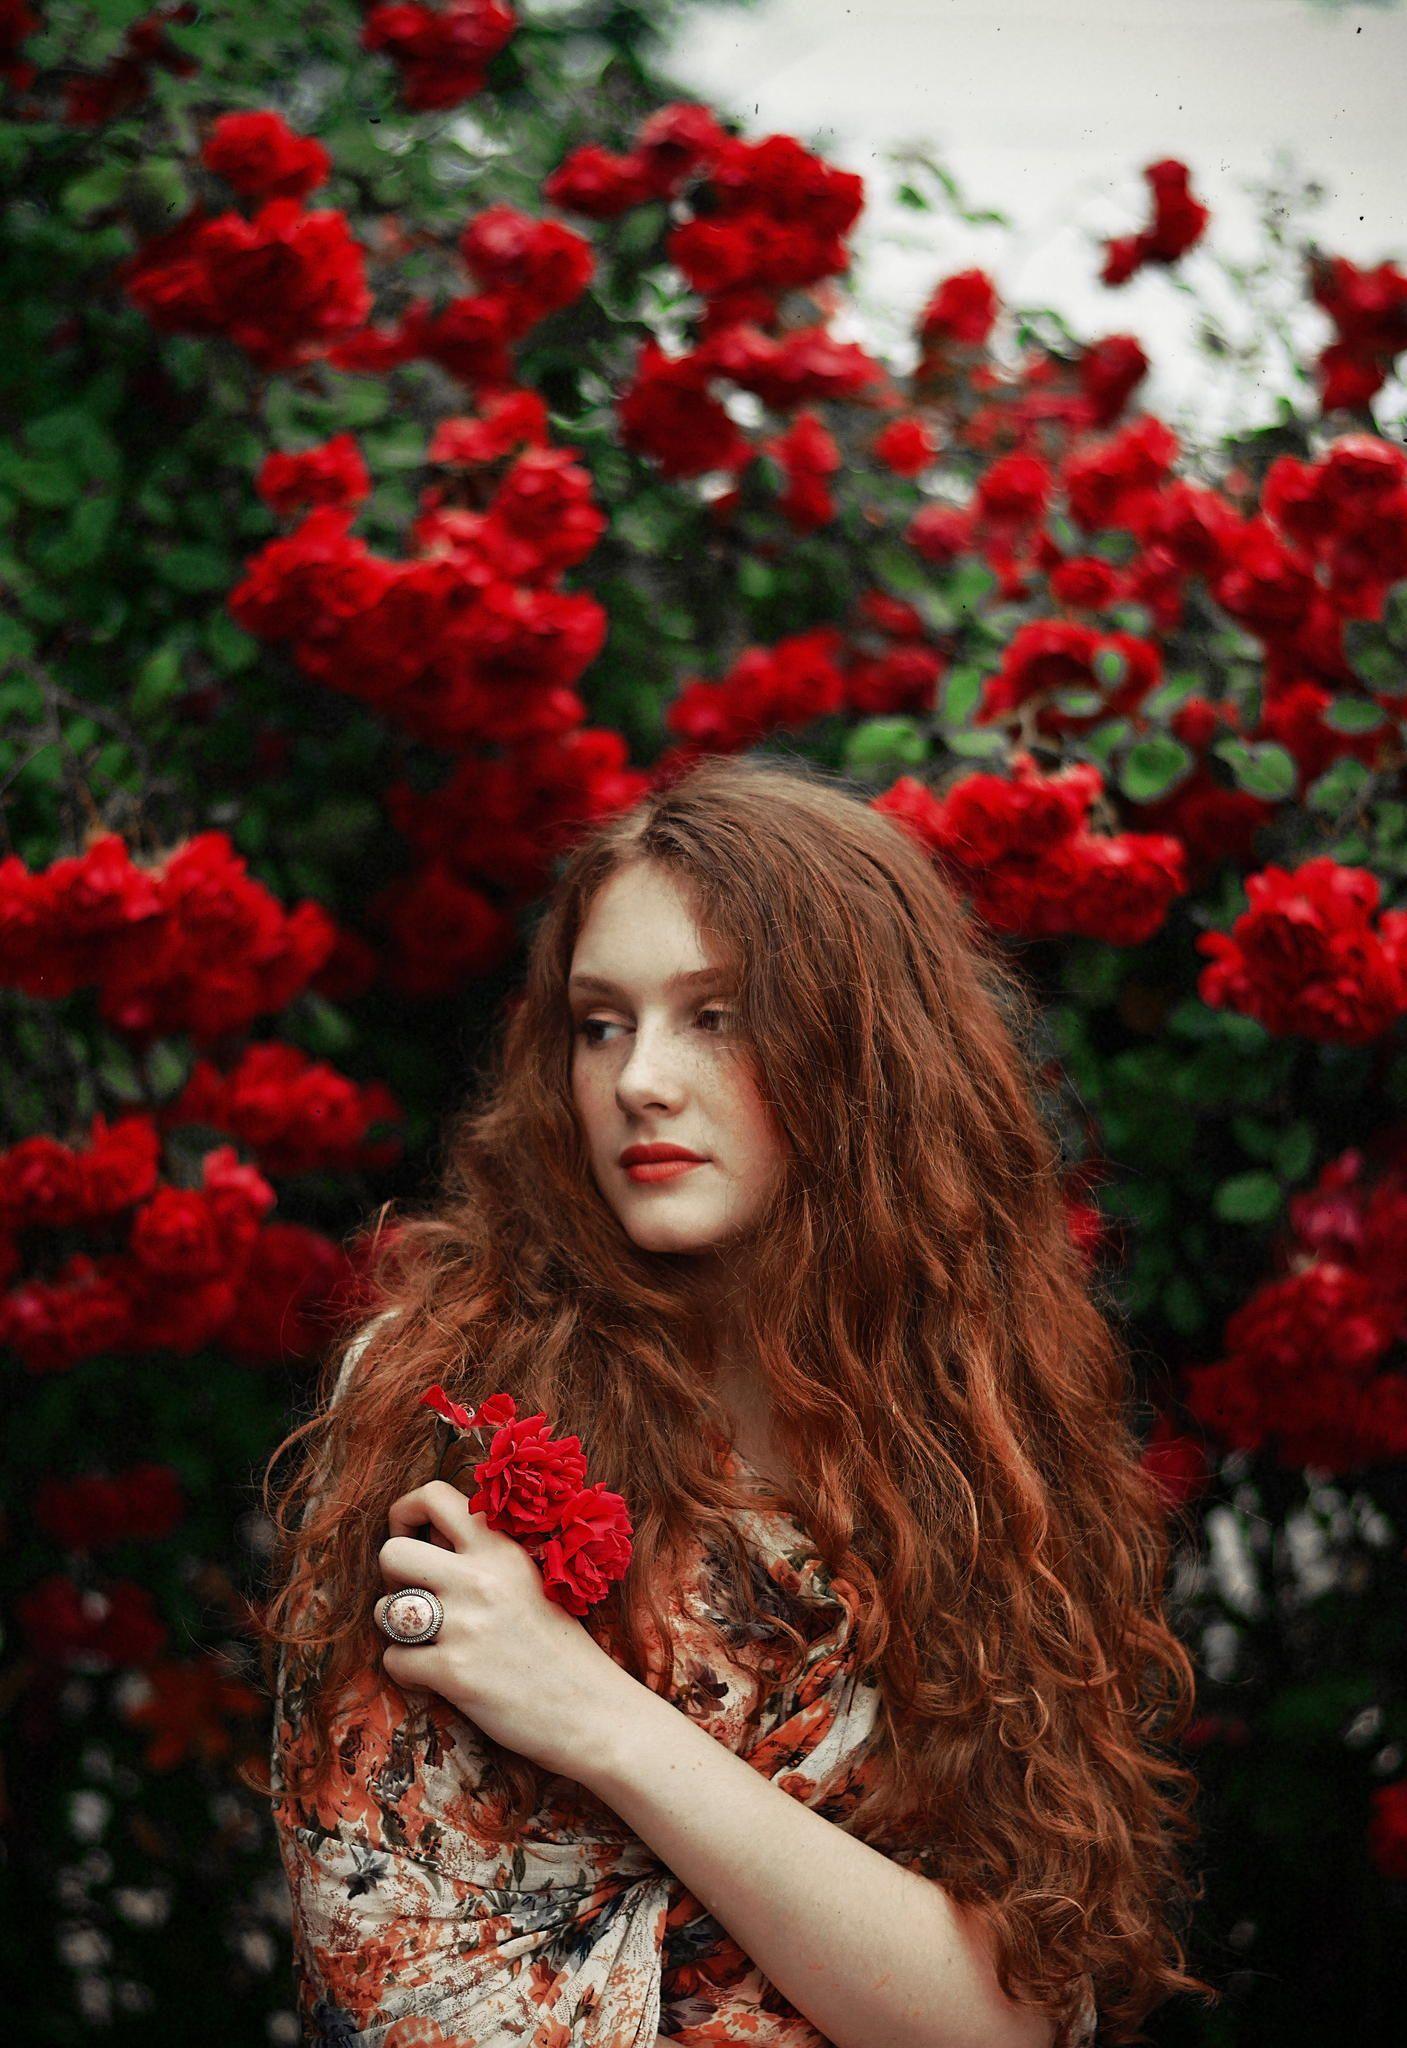 Redhead perfume models